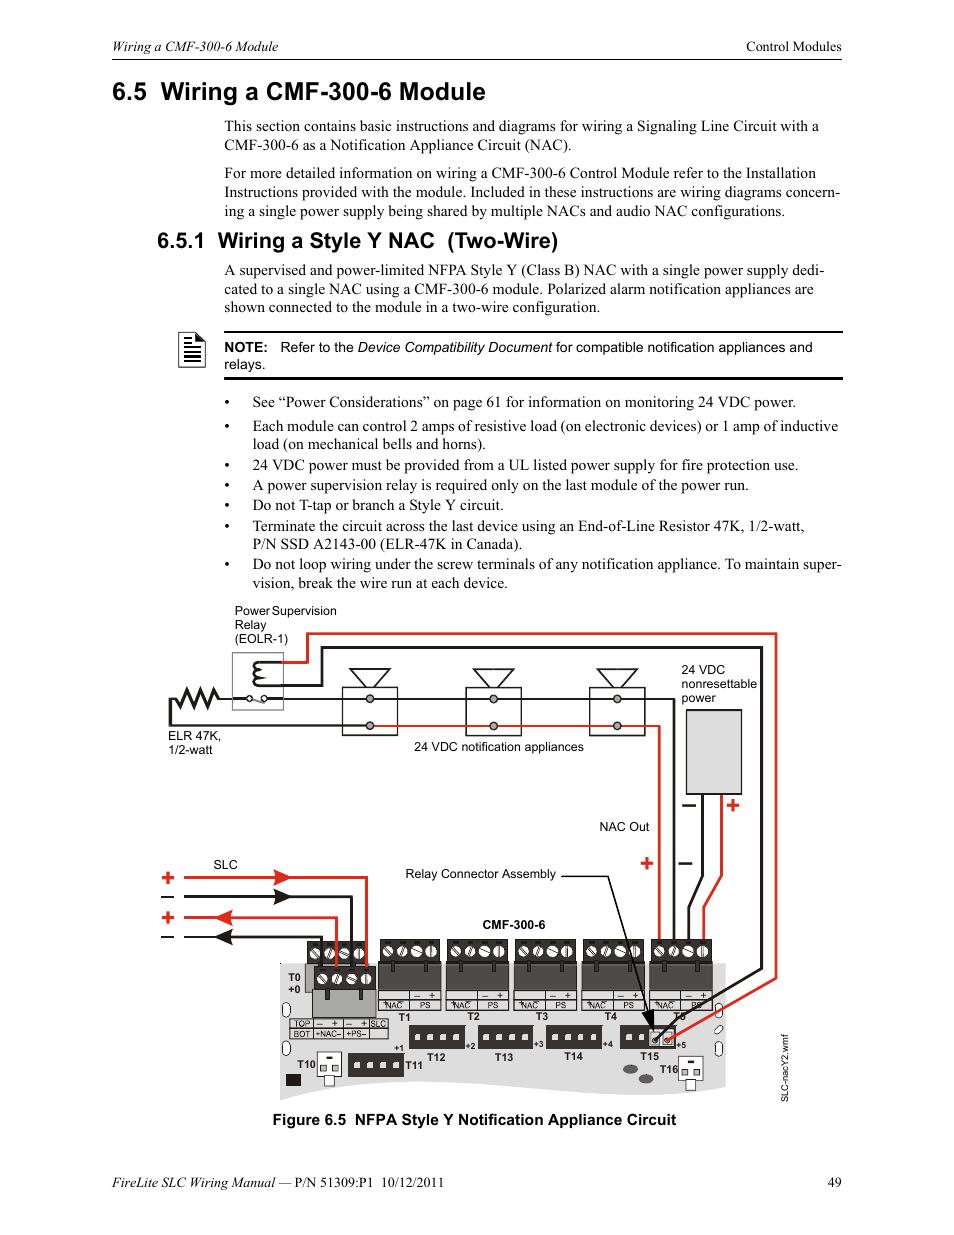 Class B Notification Appliances Wiring - Wiring Diagram •